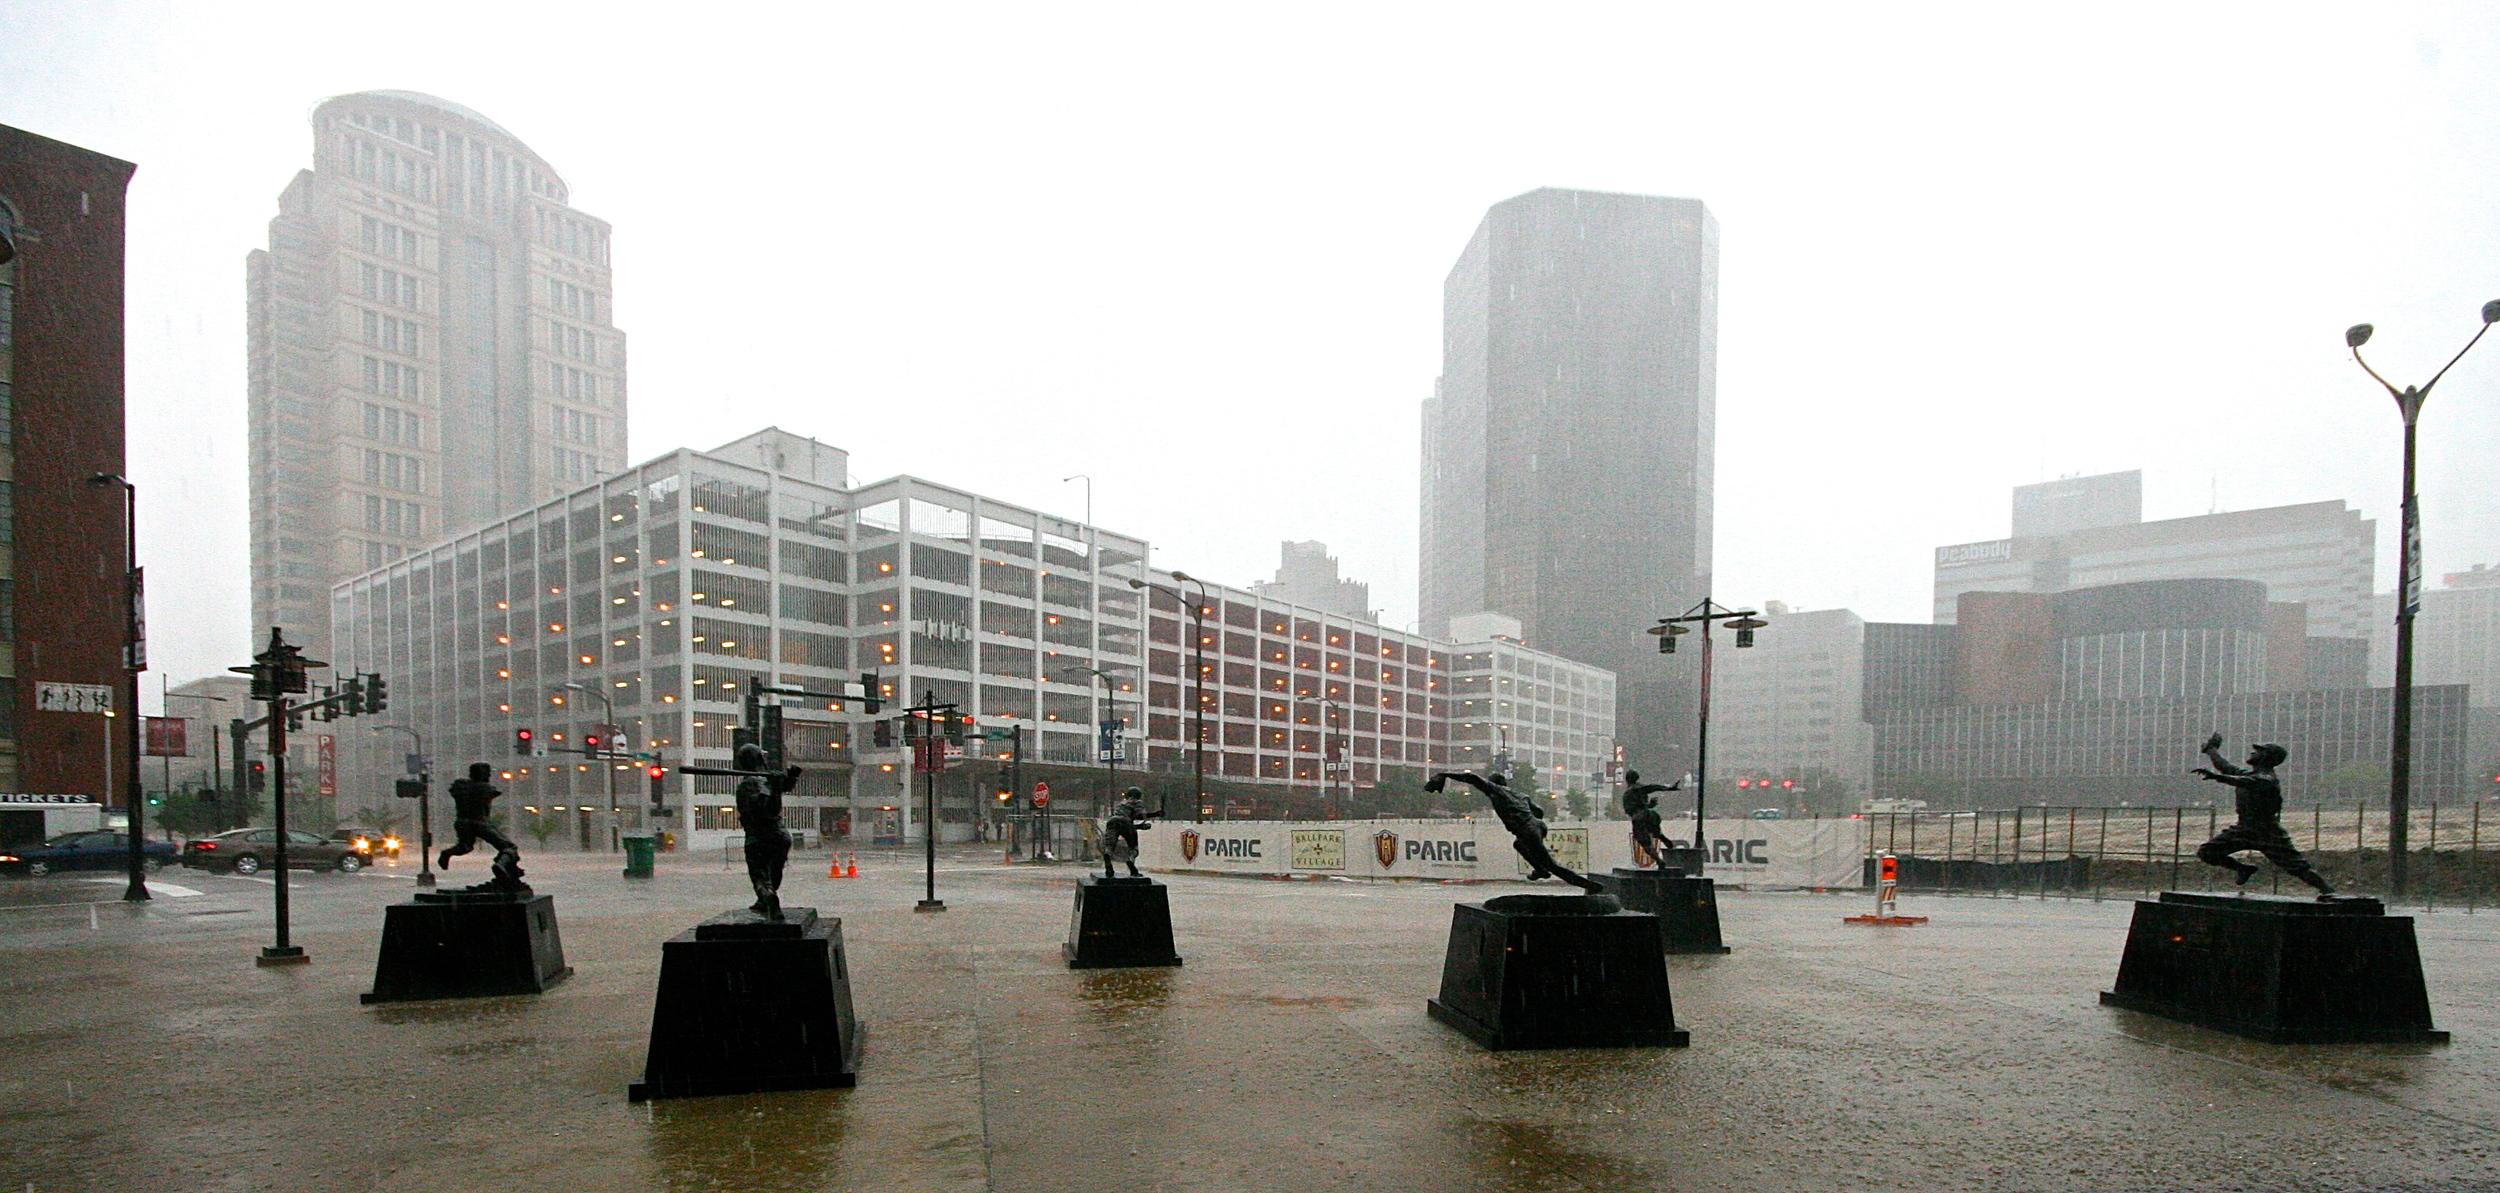 Statues in the rain